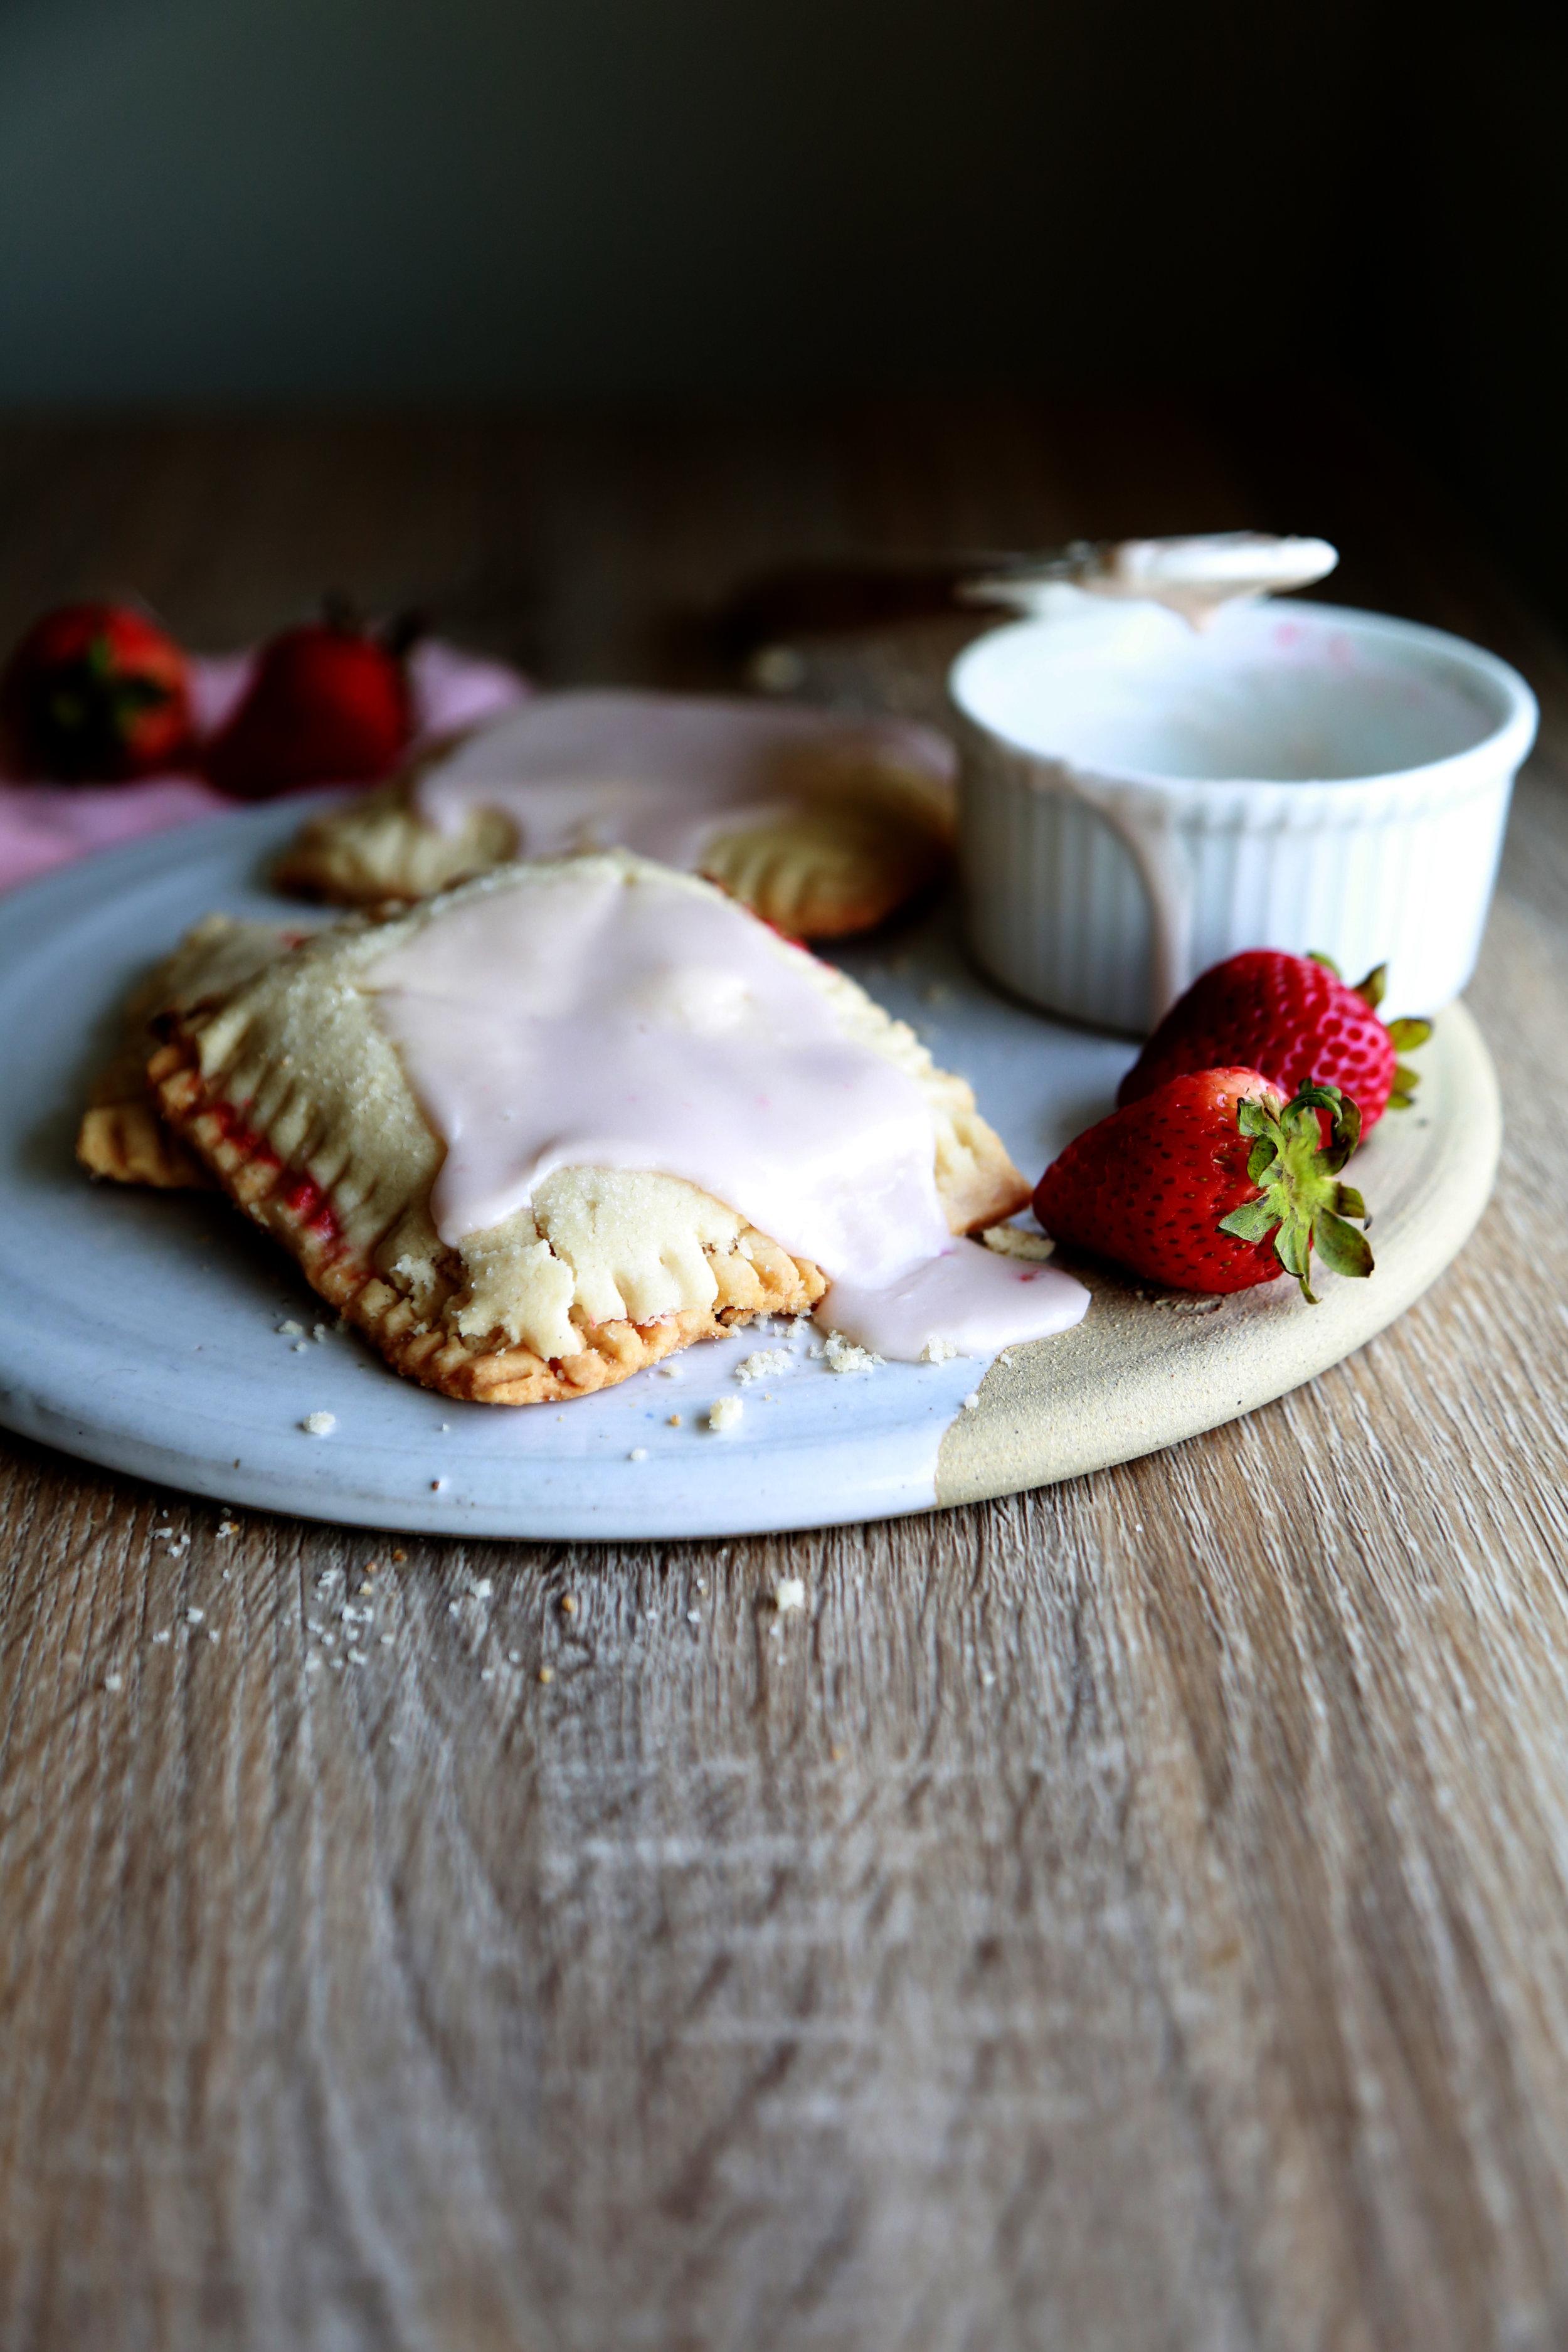 Vegan & GLuten-Free Strawberry poptart